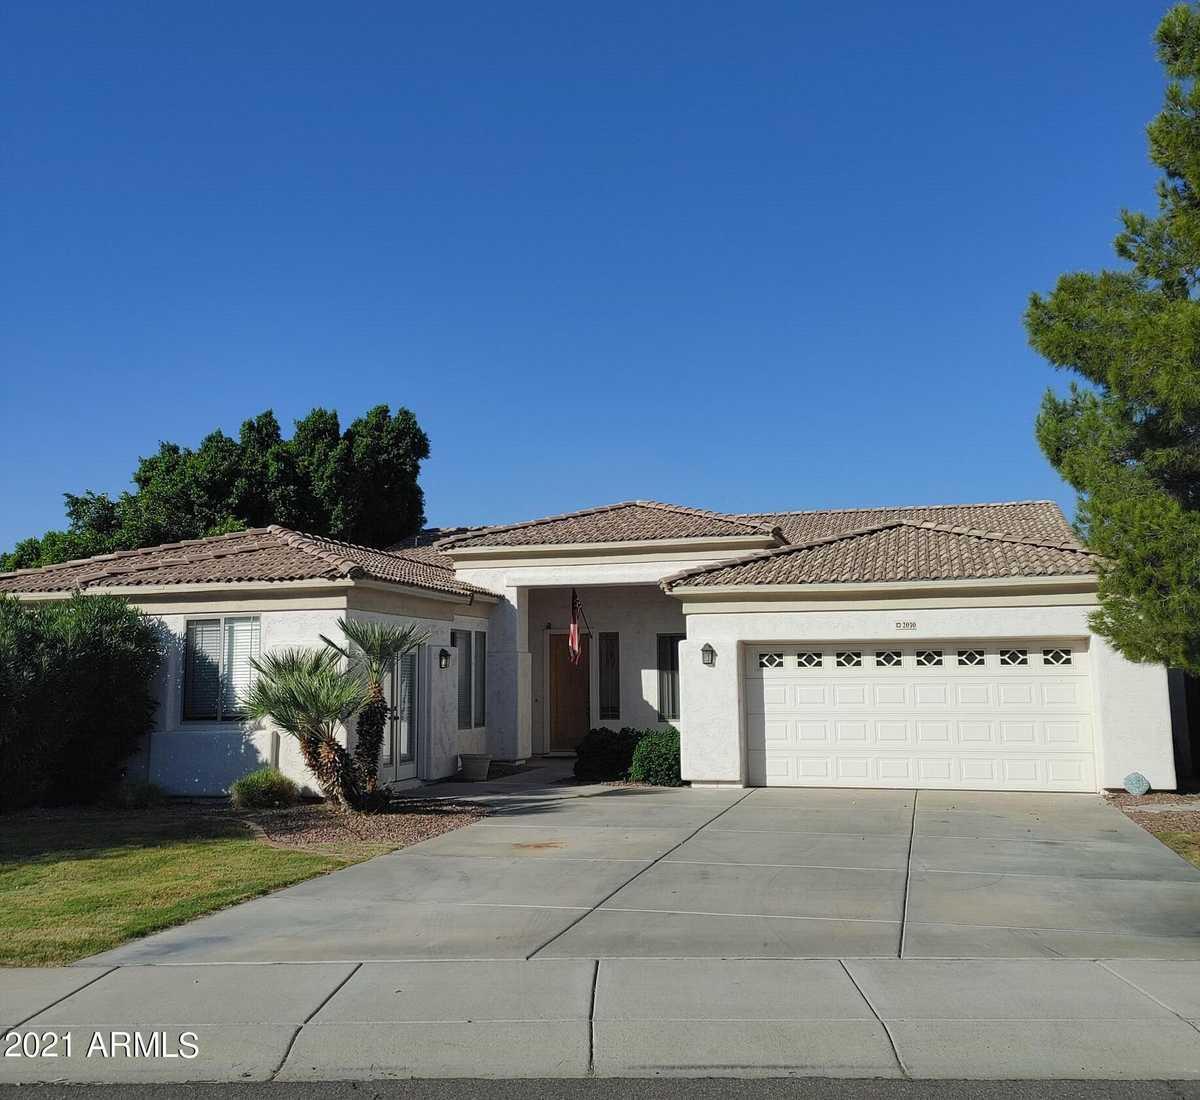 $519,000 - 4Br/3Ba - Home for Sale in Crystal Gardens Parcel 4, Avondale